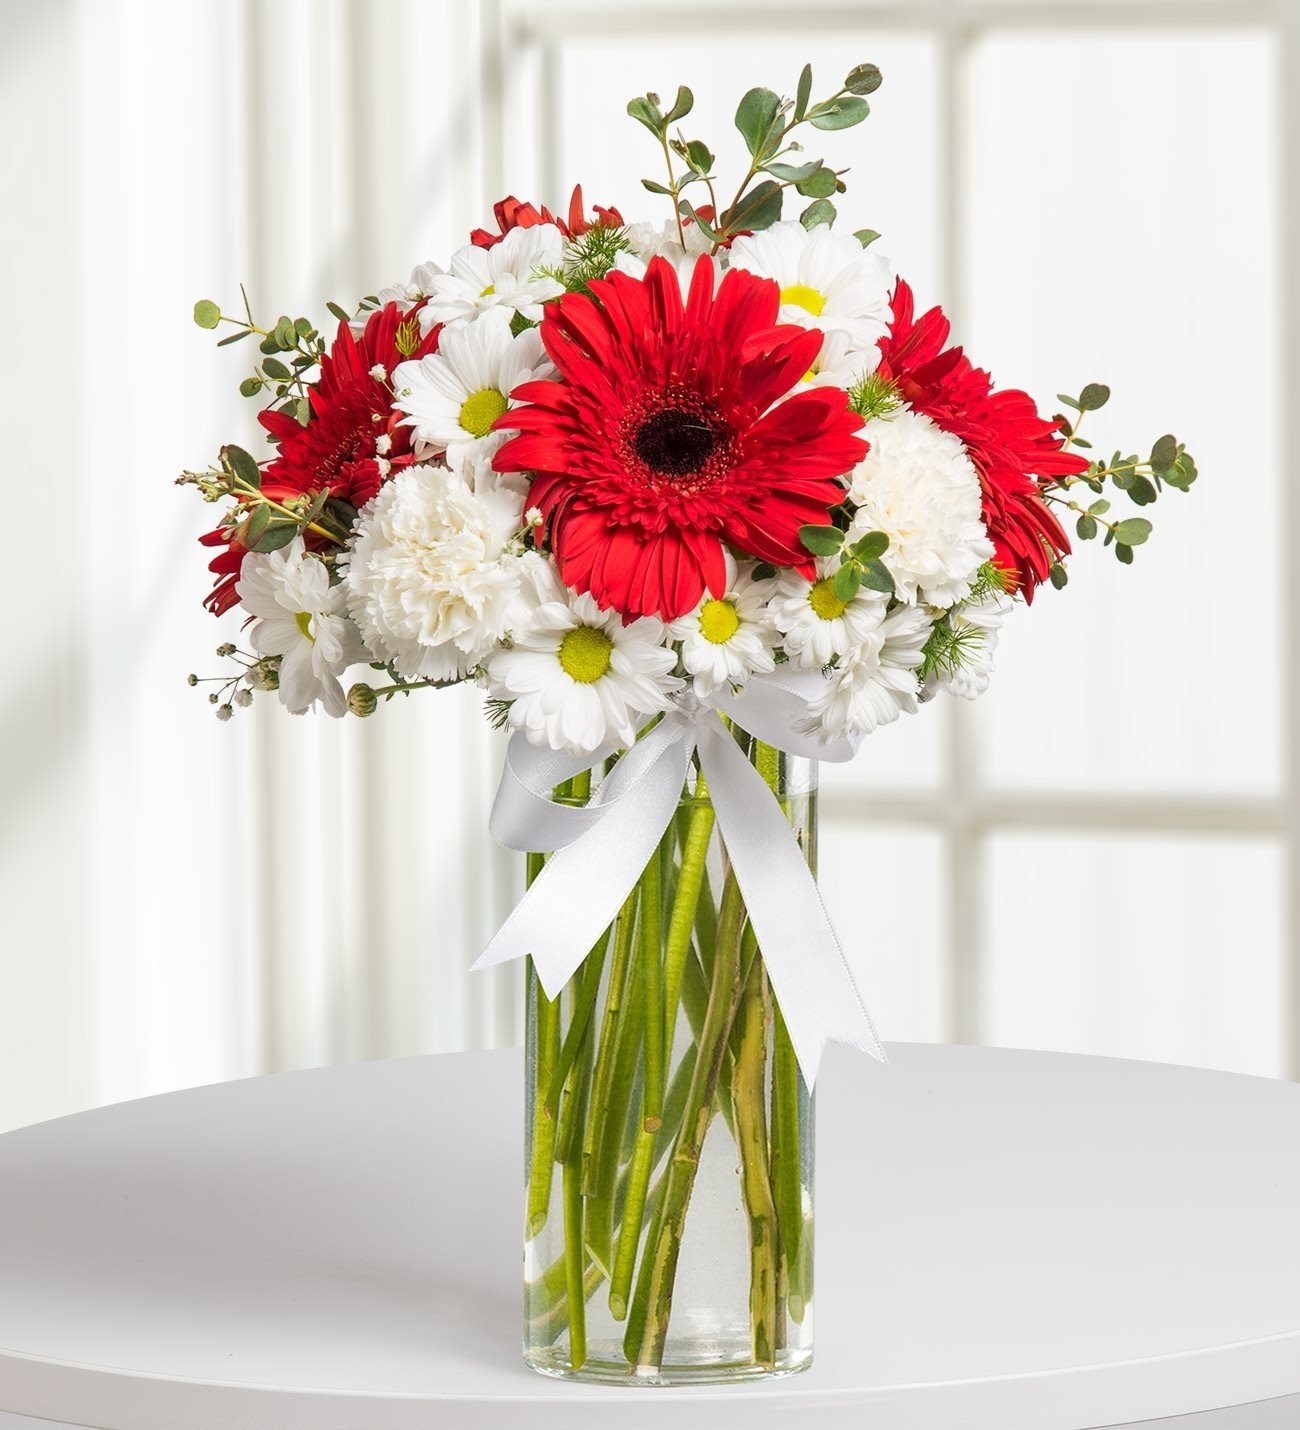 Nobility red white flower arrangement kc143591 izmirmasajfo